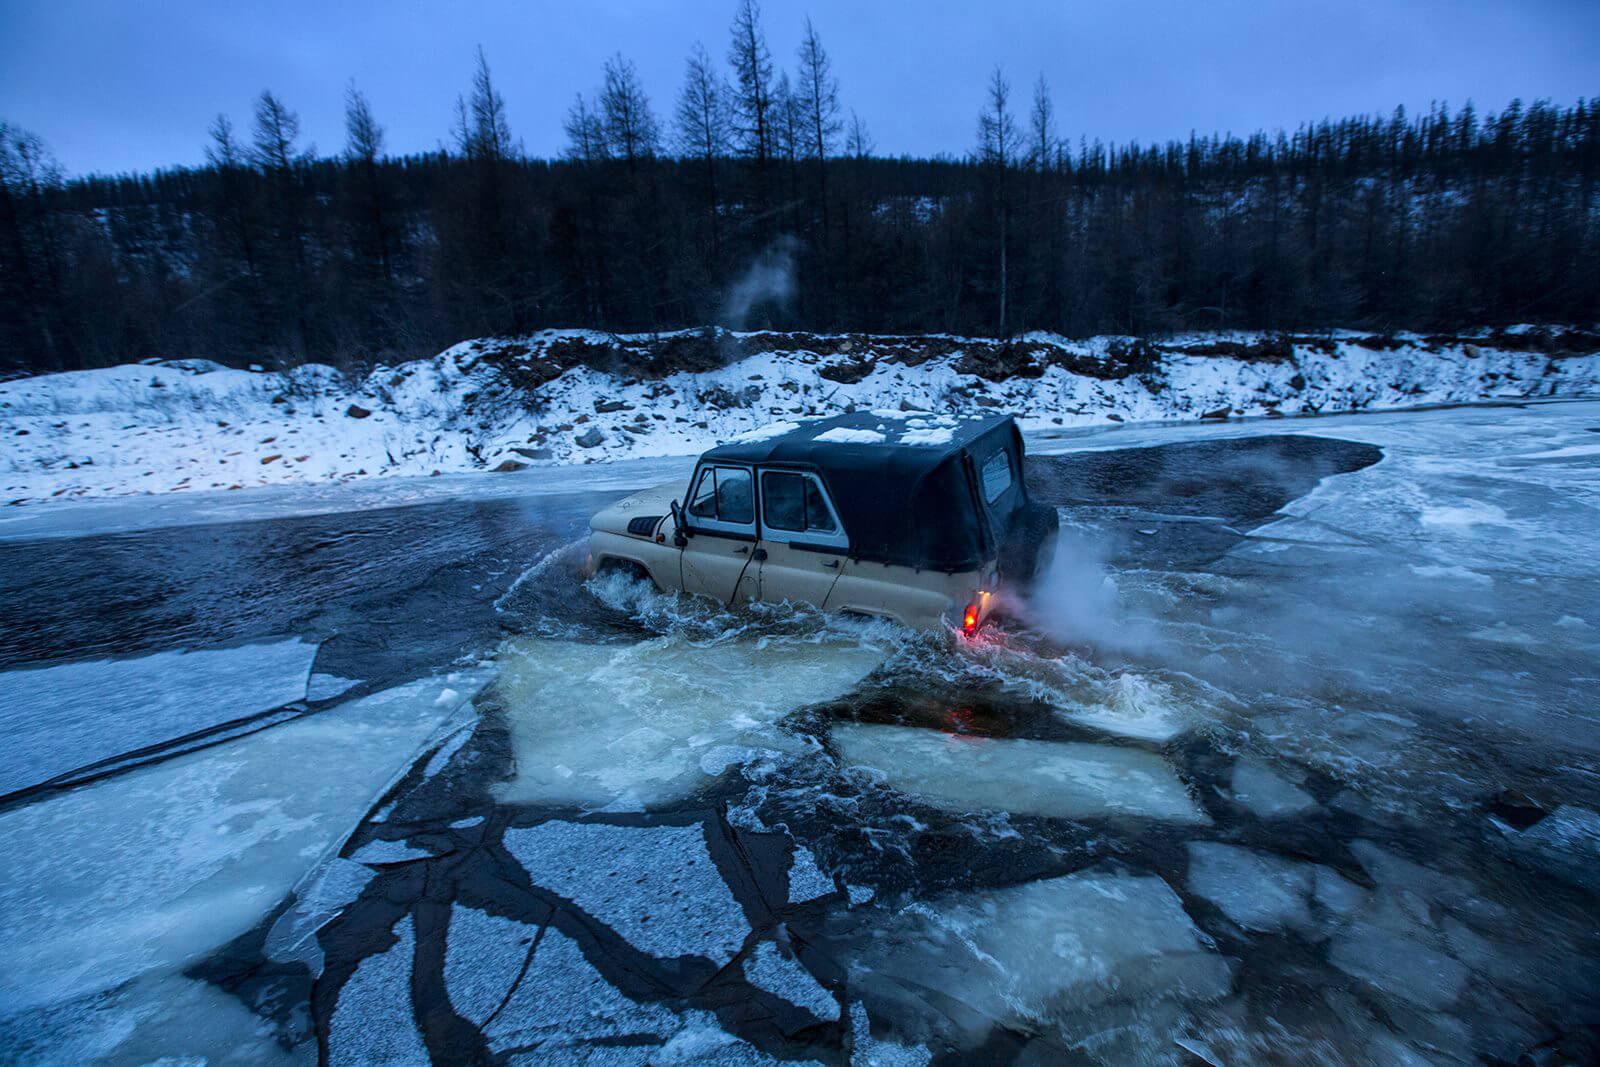 Якутия. Дорога через реку. Так я добирался до эвенкийский оленеводов. © Александр Химушин / The World In Faces